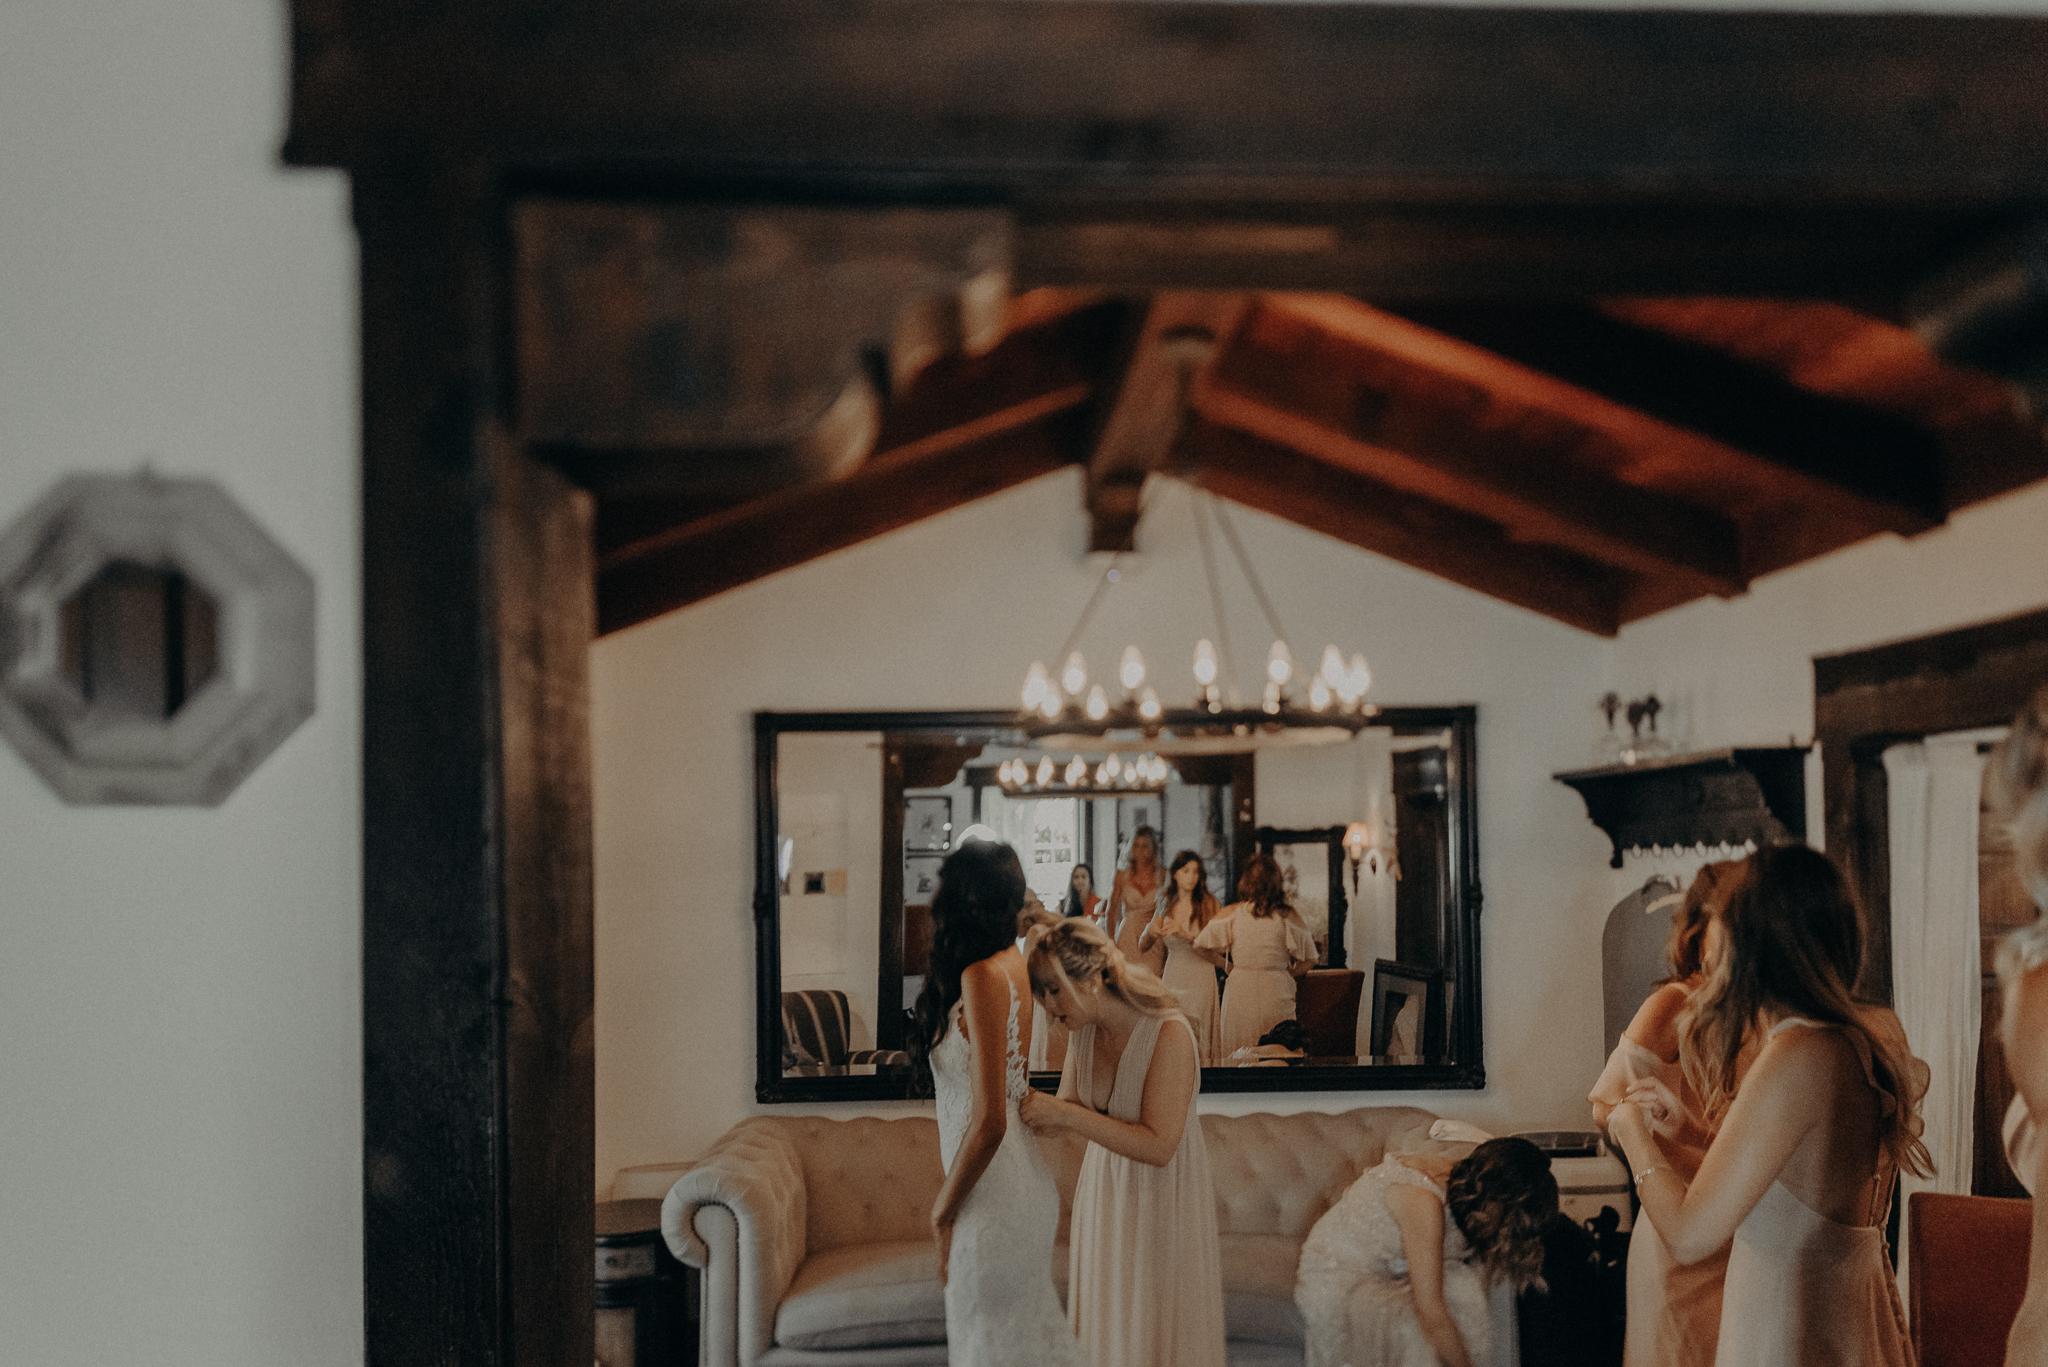 Isaiah + Taylor Photography - Rancho Las Lomas Wedding, Los Angeles Wedding Photographer-011.jpg